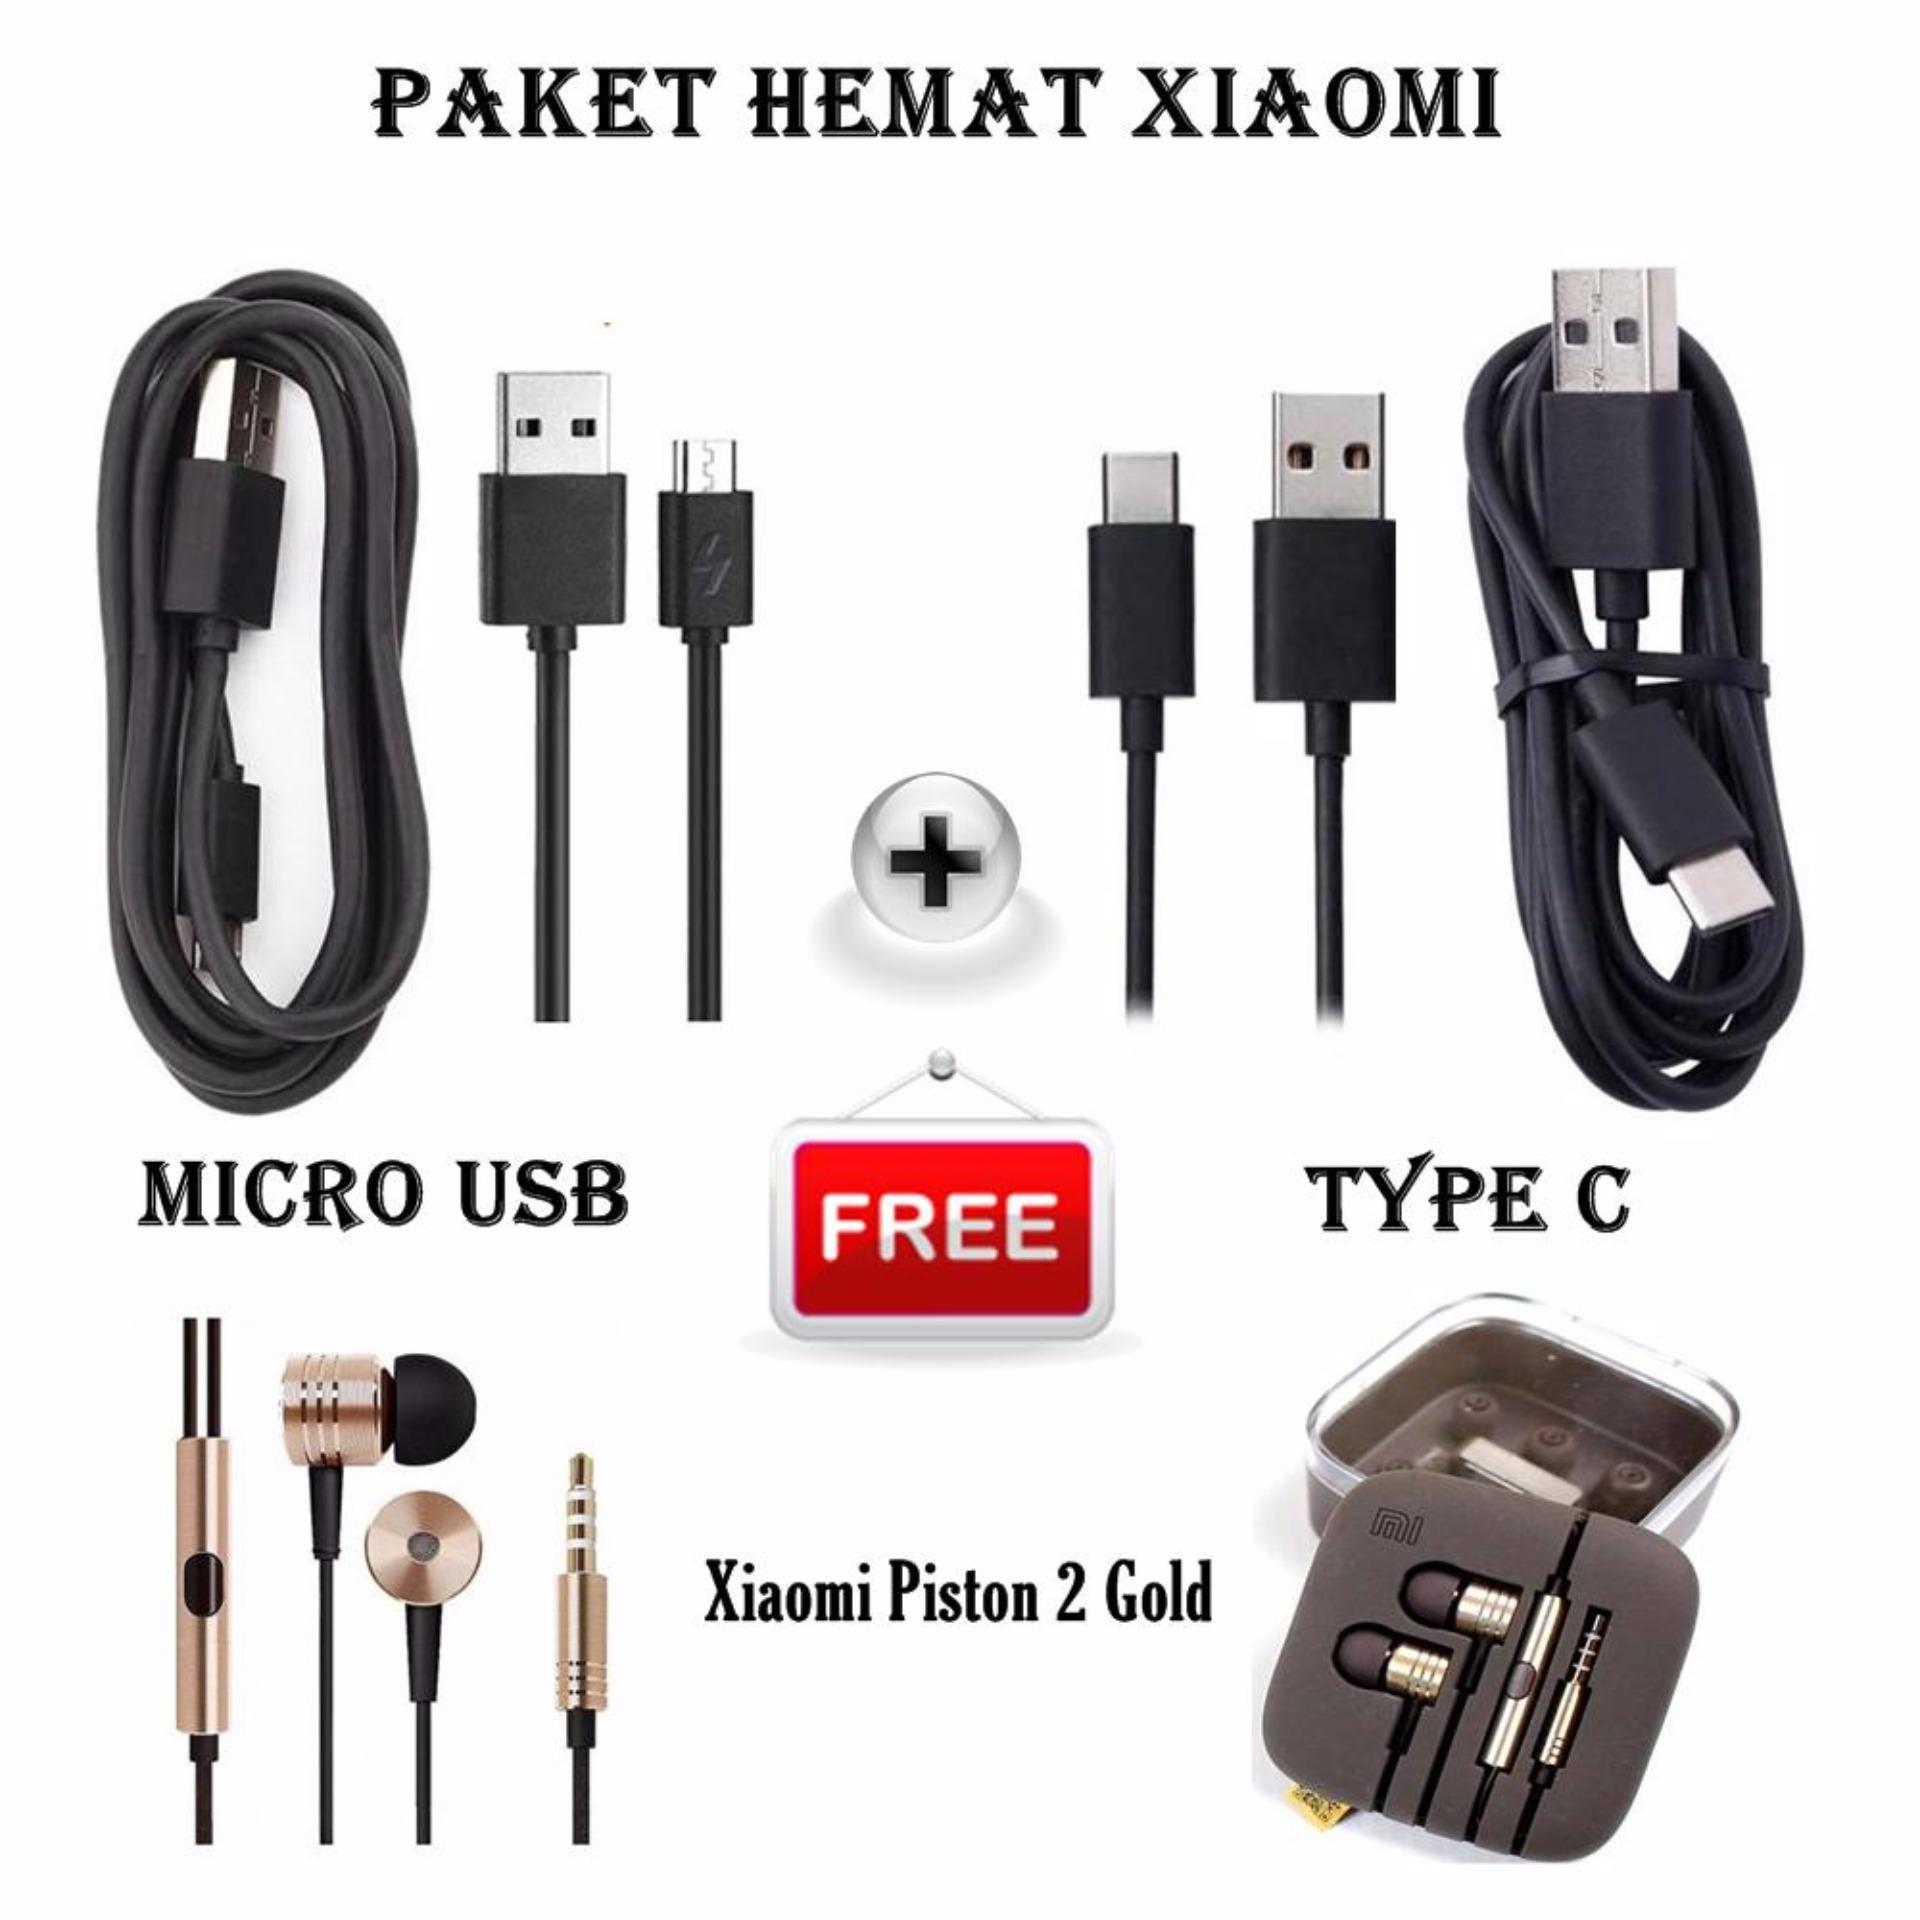 Belanja Terbaik Paket Hemat Original Xiaomi Kabel Data Micro Usb Type C Gratis